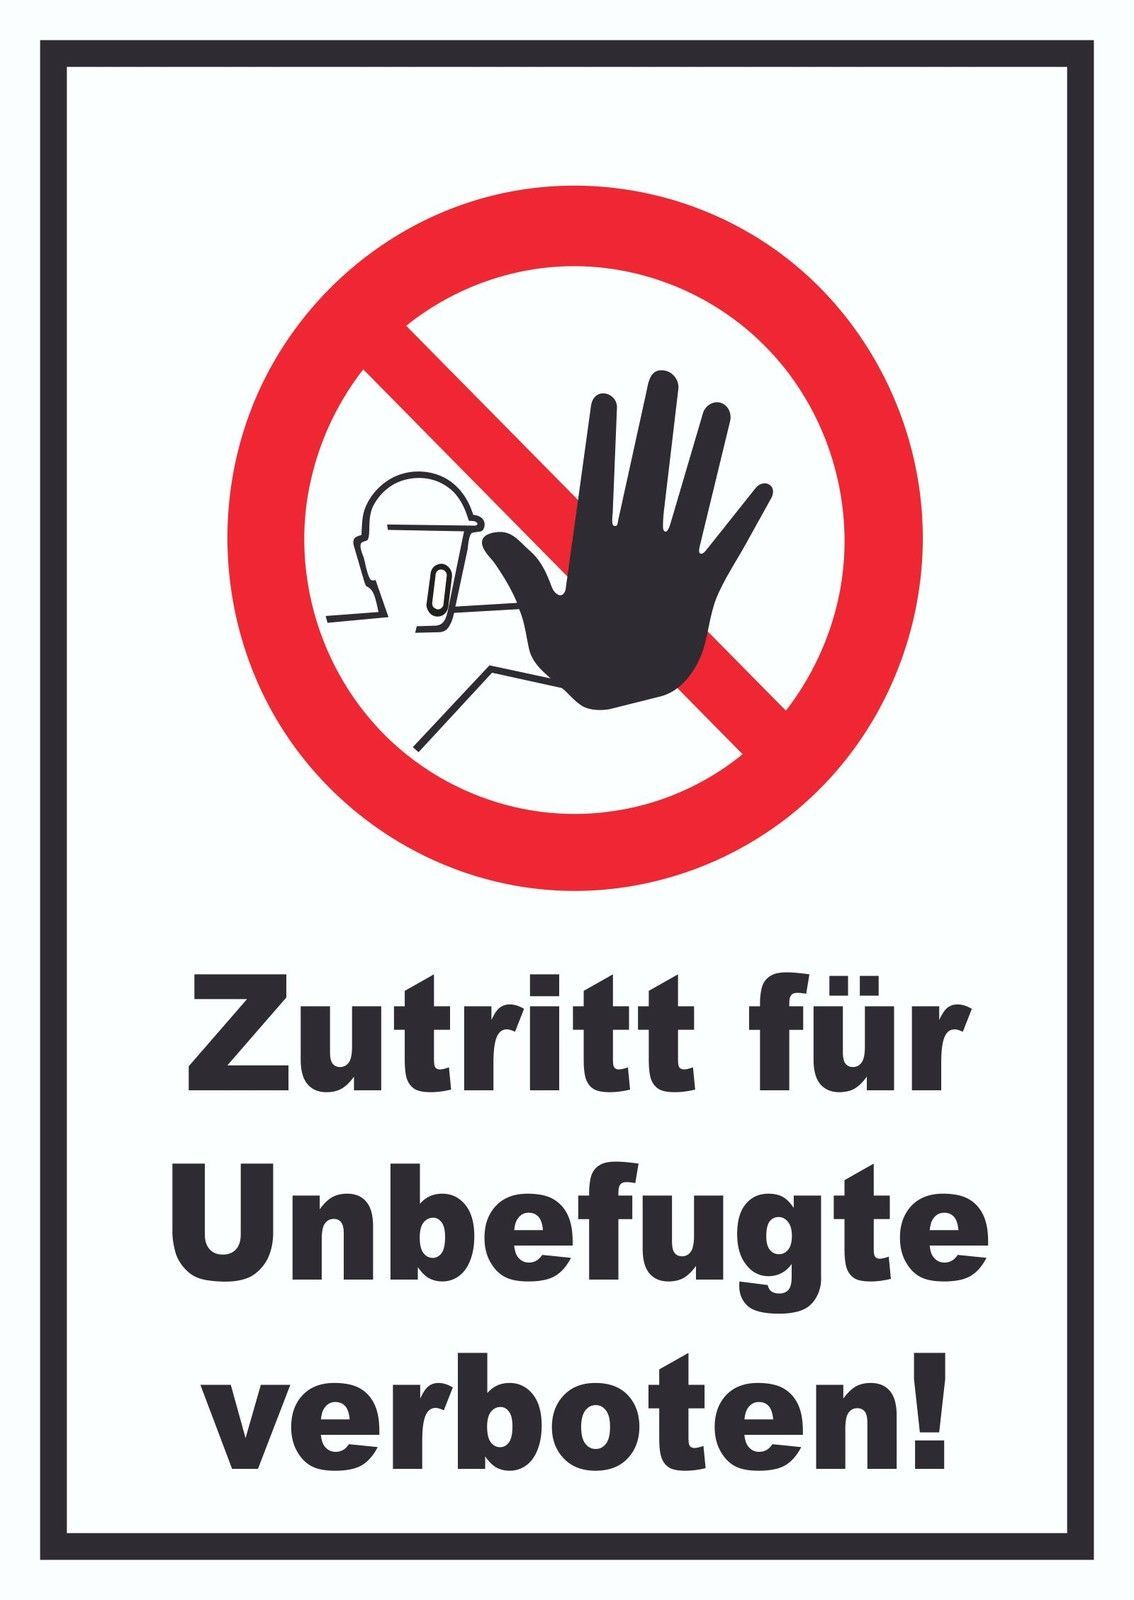 Verbotsschild Zutritt Fur Unbefugte Verboten Verbot Schilder Zutritt Zugang Eintritt Verbotsschilder Schilder Turschilder